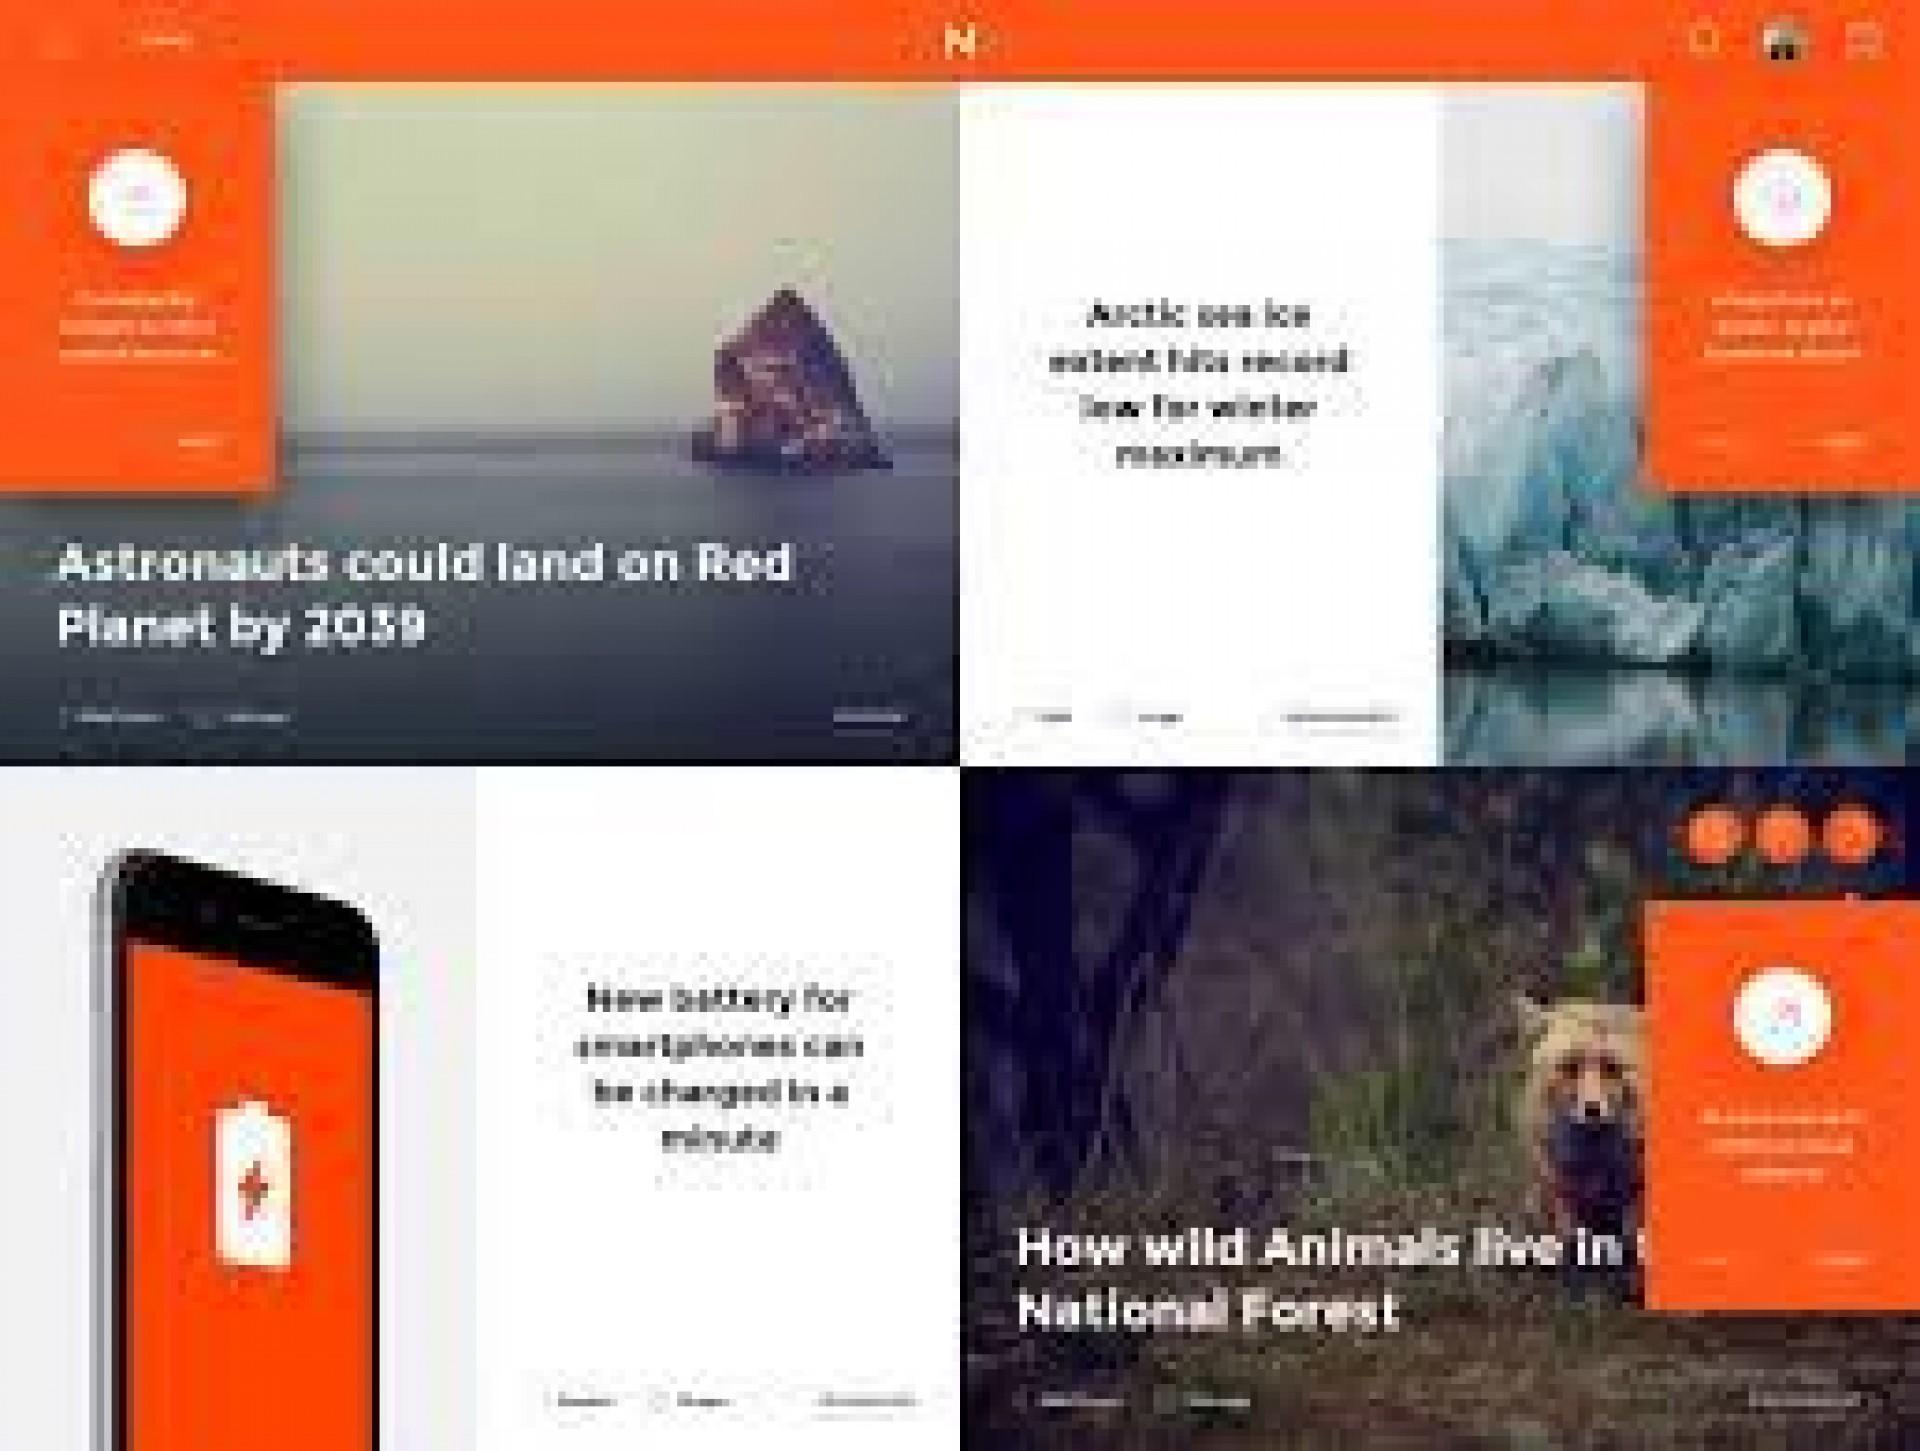 004 Remarkable Mobile App Design Template High Def  Size Free Download Ui Psd1920